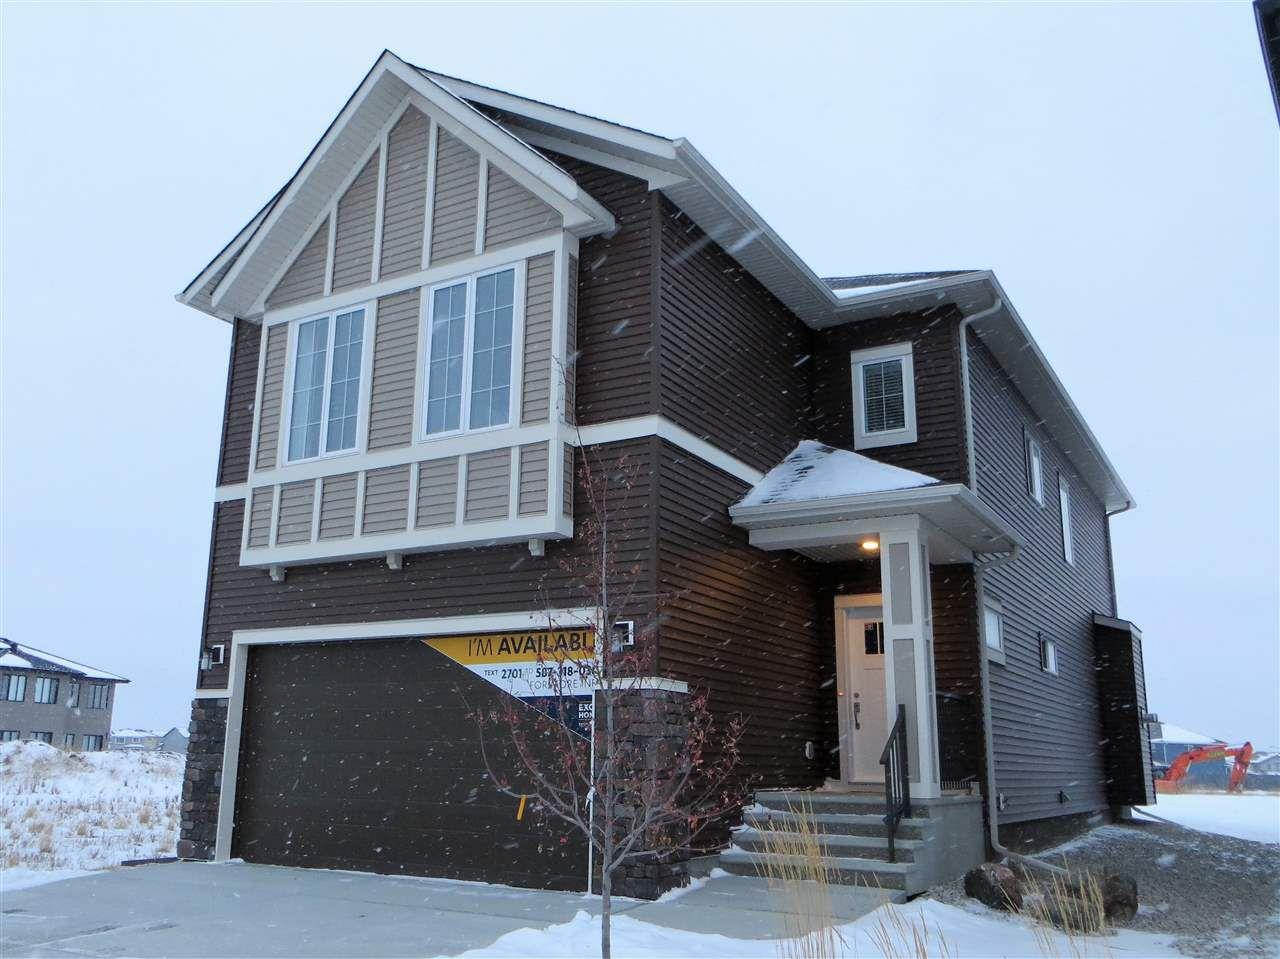 Main Photo: 487 CRYSTALLINA NERA Drive in Edmonton: Zone 28 House for sale : MLS®# E4093661